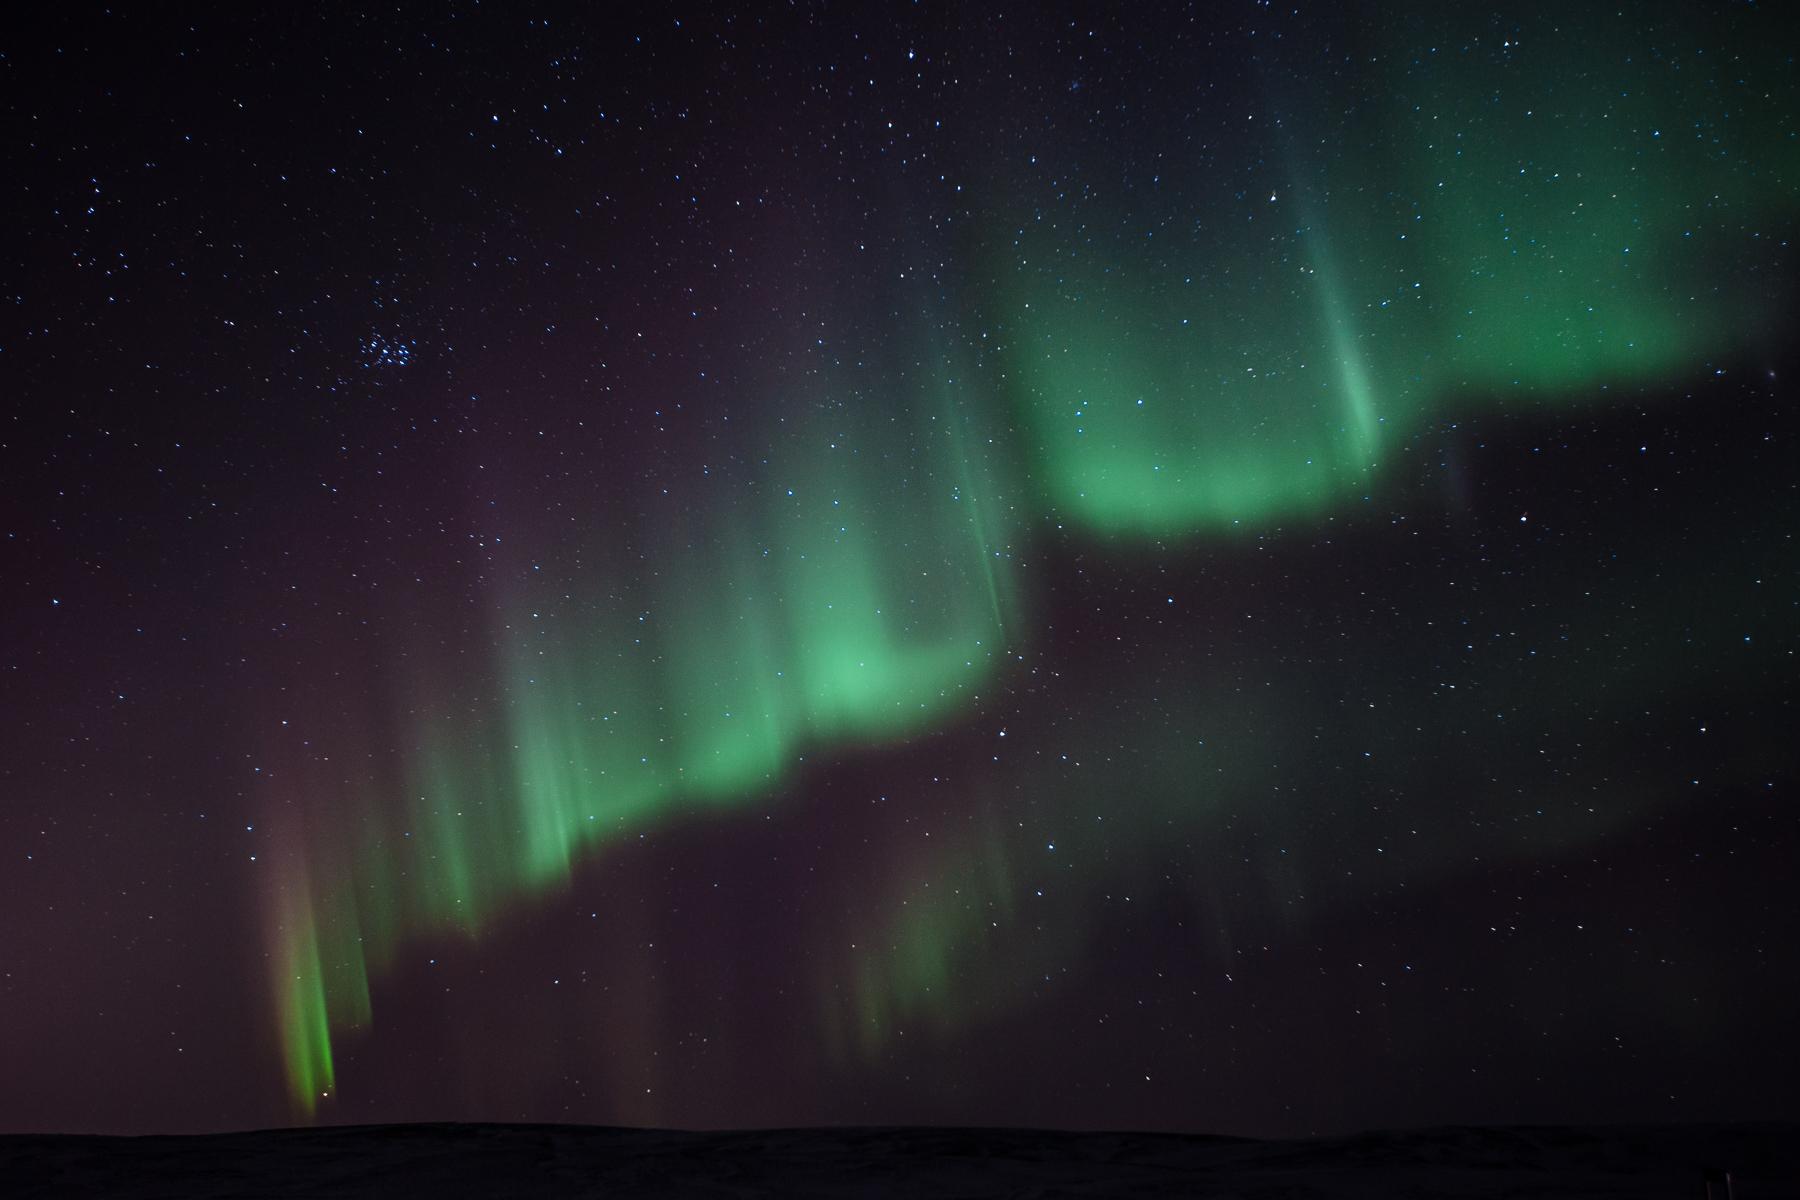 fotografando a aurora boreal camilla cheade